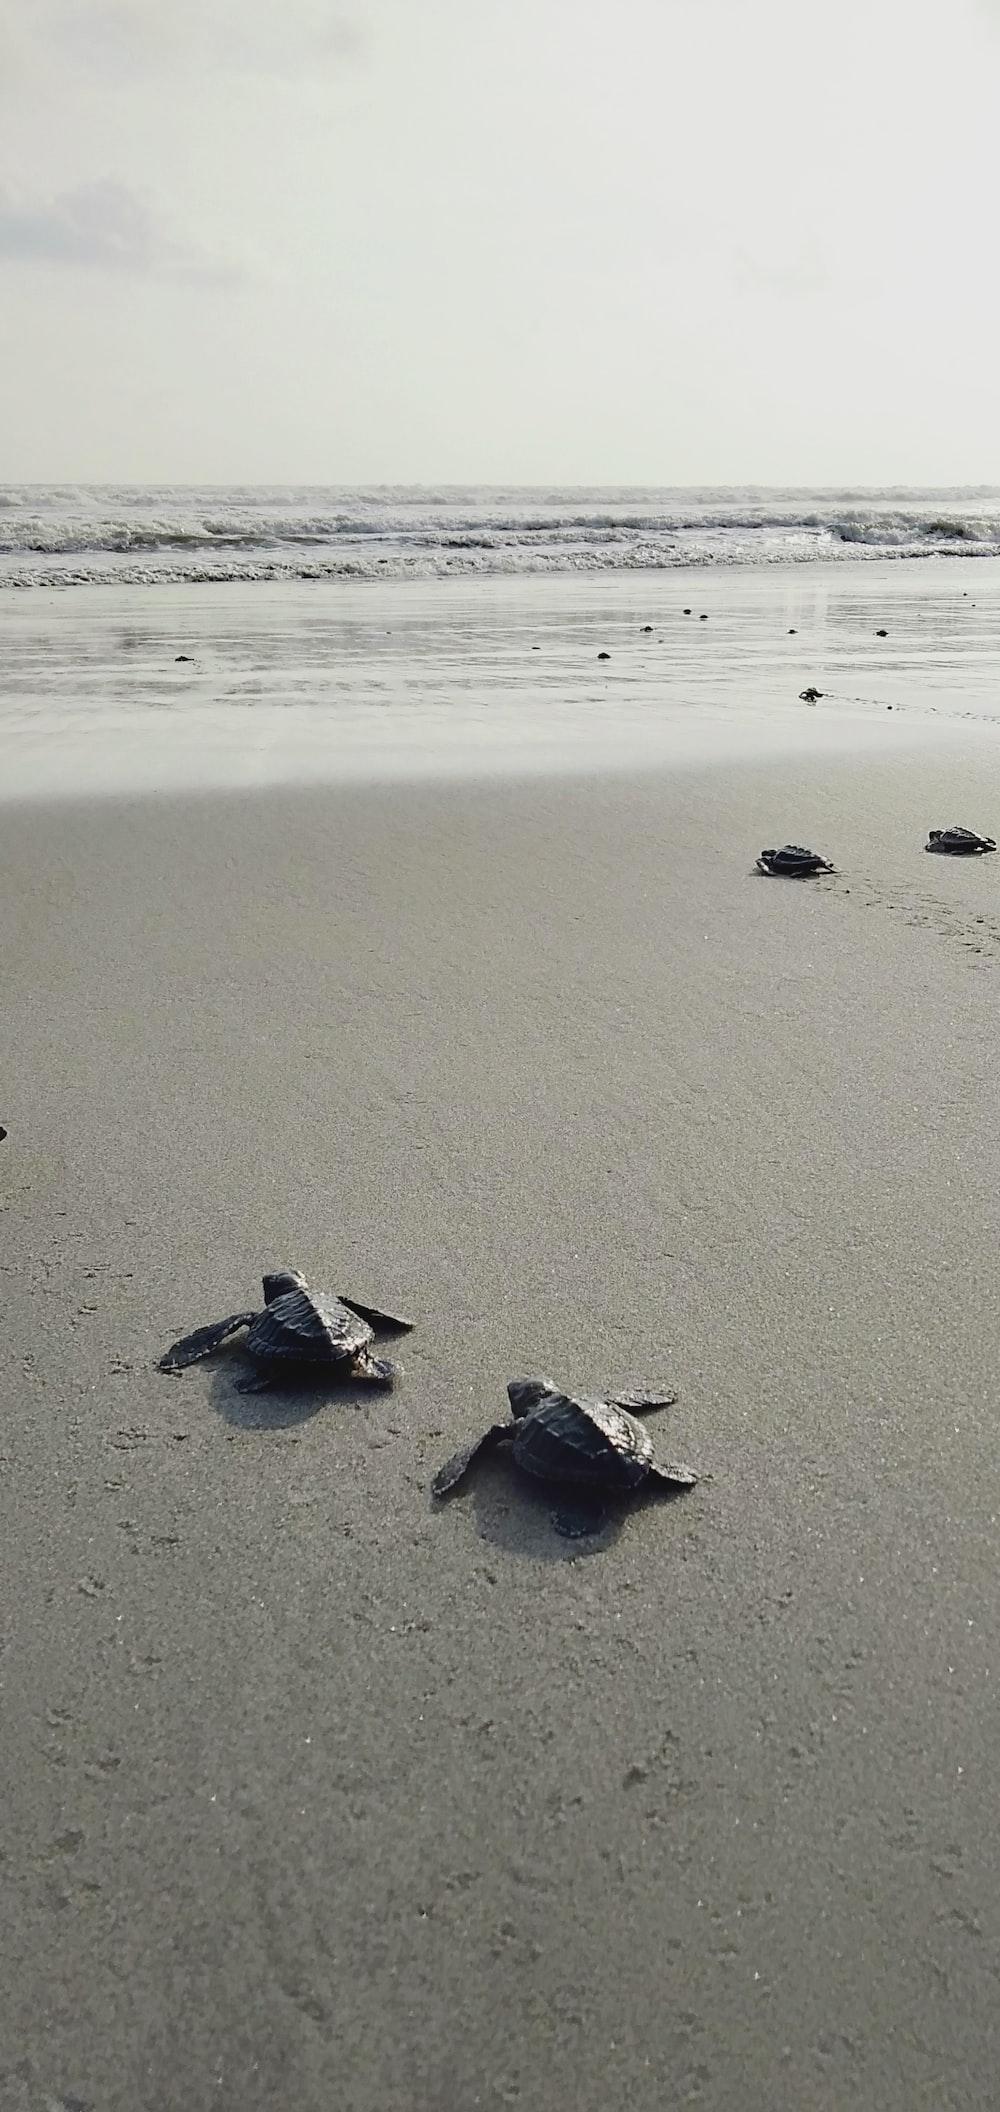 gray turtles near seashore